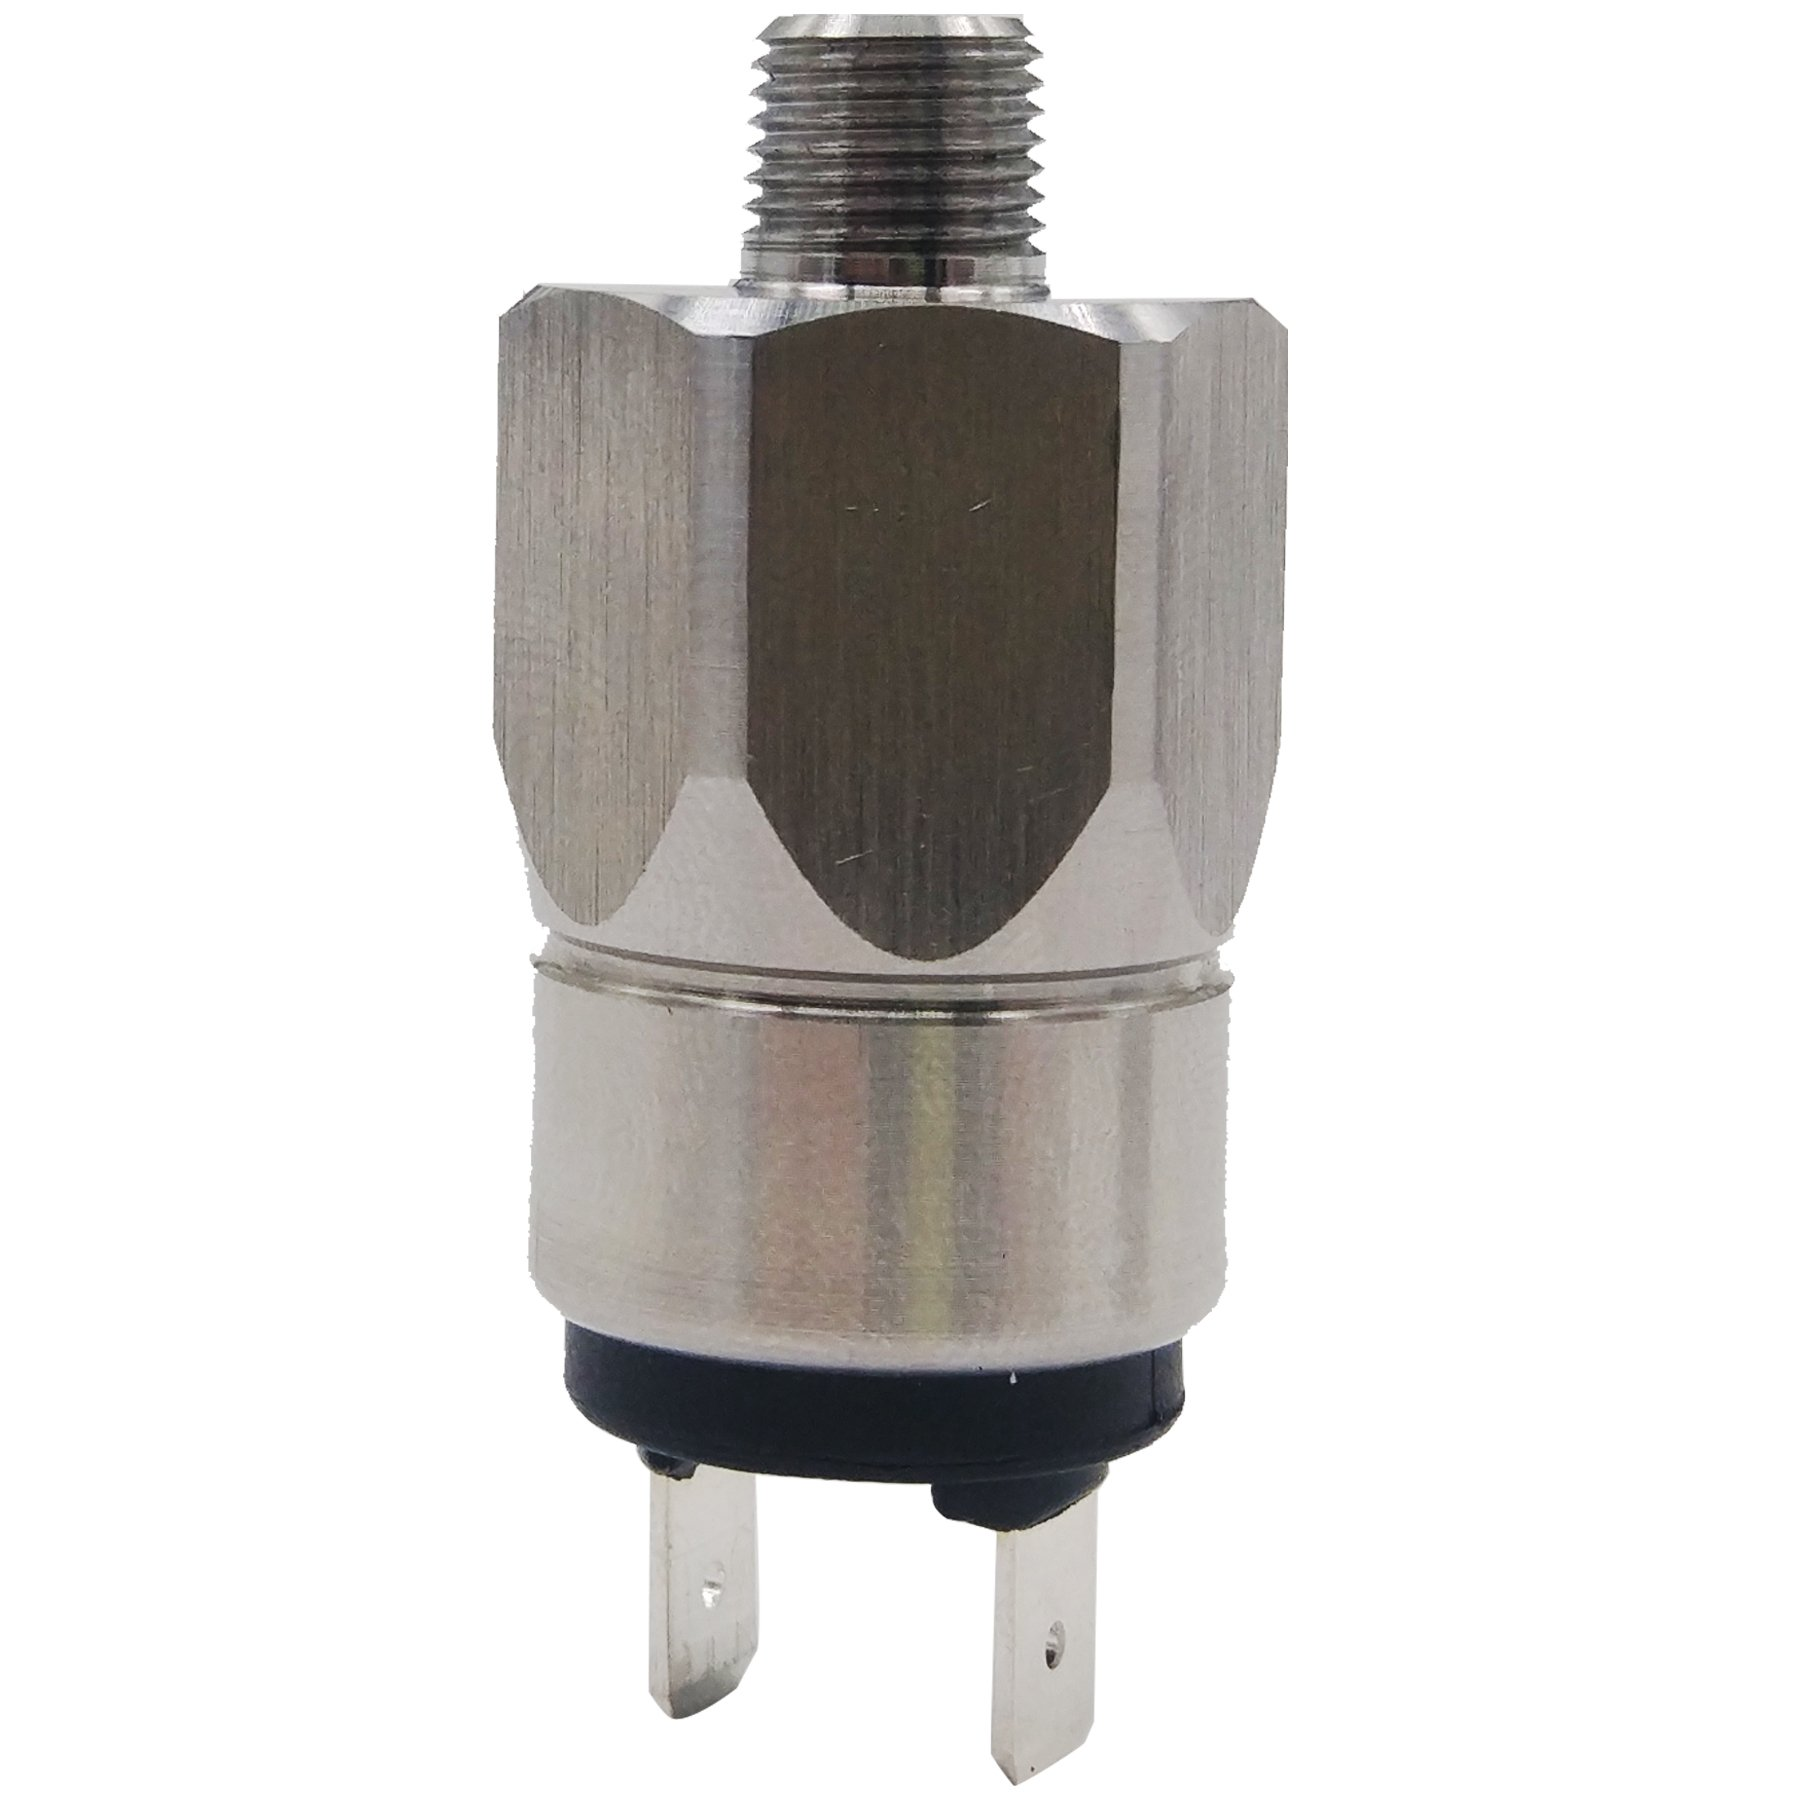 Dracarys Pressure Sensor Upgrade Nitrous Oxide Controllers Bottle Heater Pressure Transducer (1PCS) by Dracarys